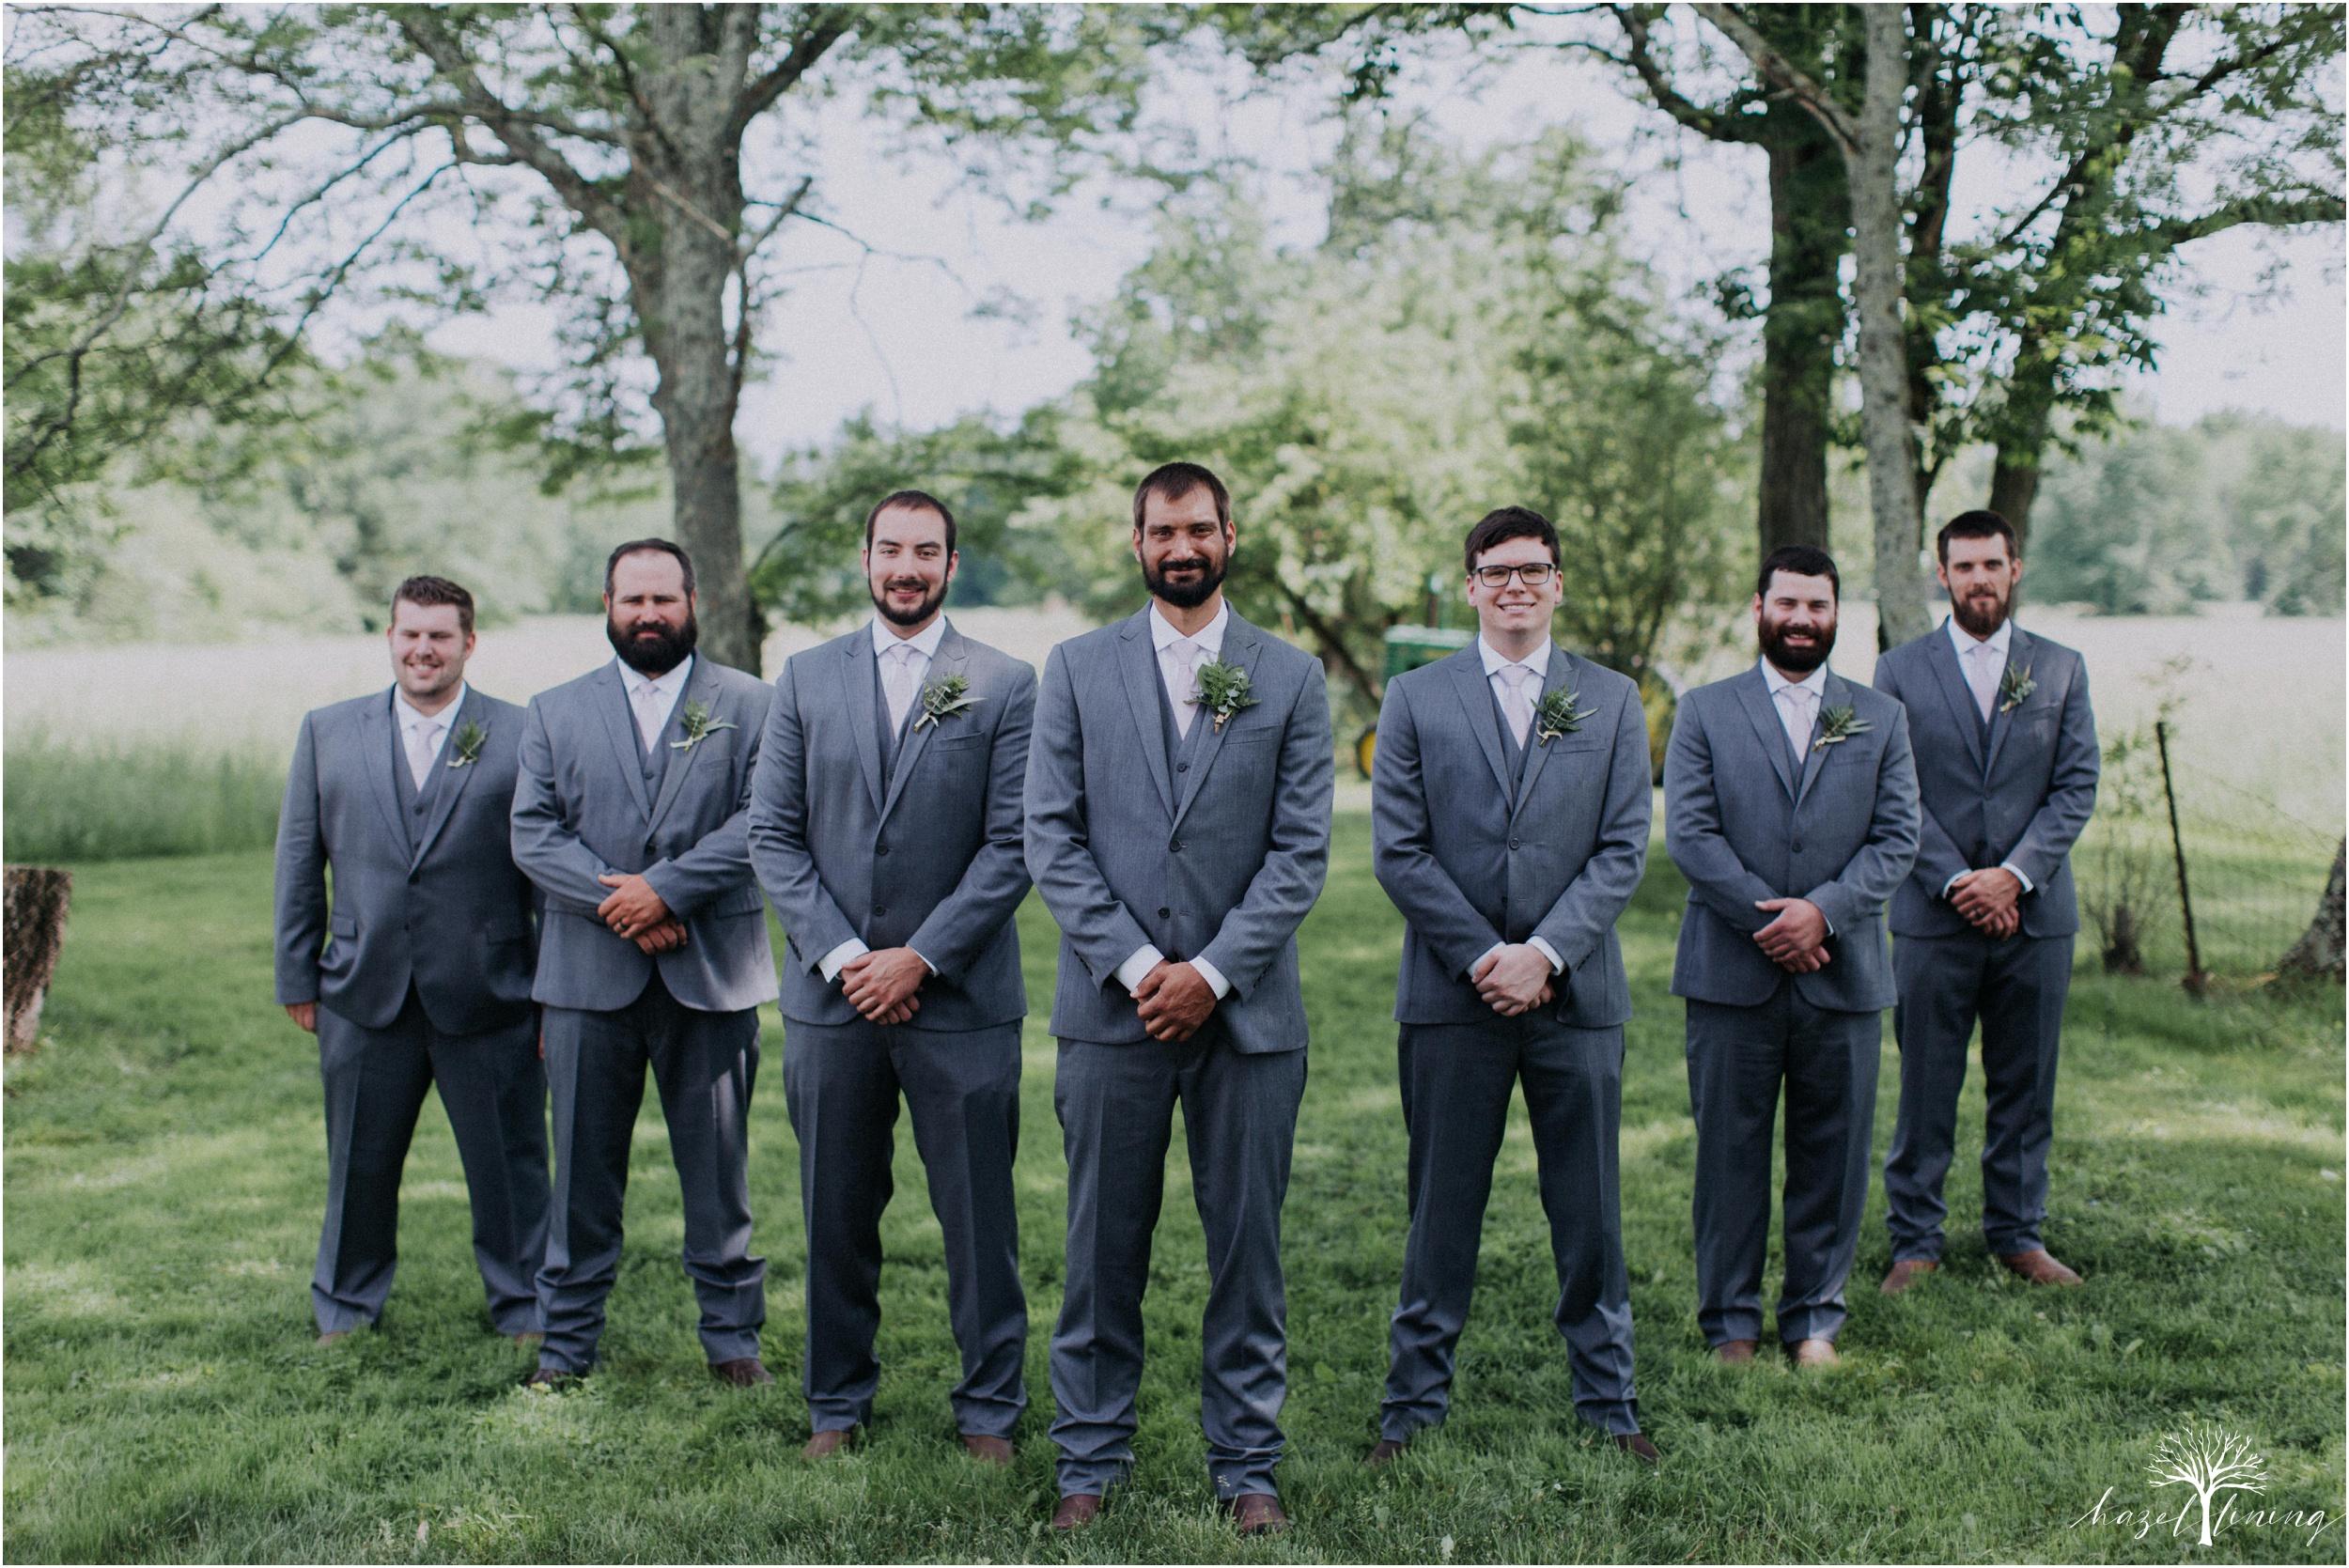 hazel-lining-travel-wedding-elopement-photography-lisa-landon-shoemaker-the-farm-bakery-and-events-bucks-county-quakertown-pennsylvania-summer-country-outdoor-farm-wedding_0044.jpg